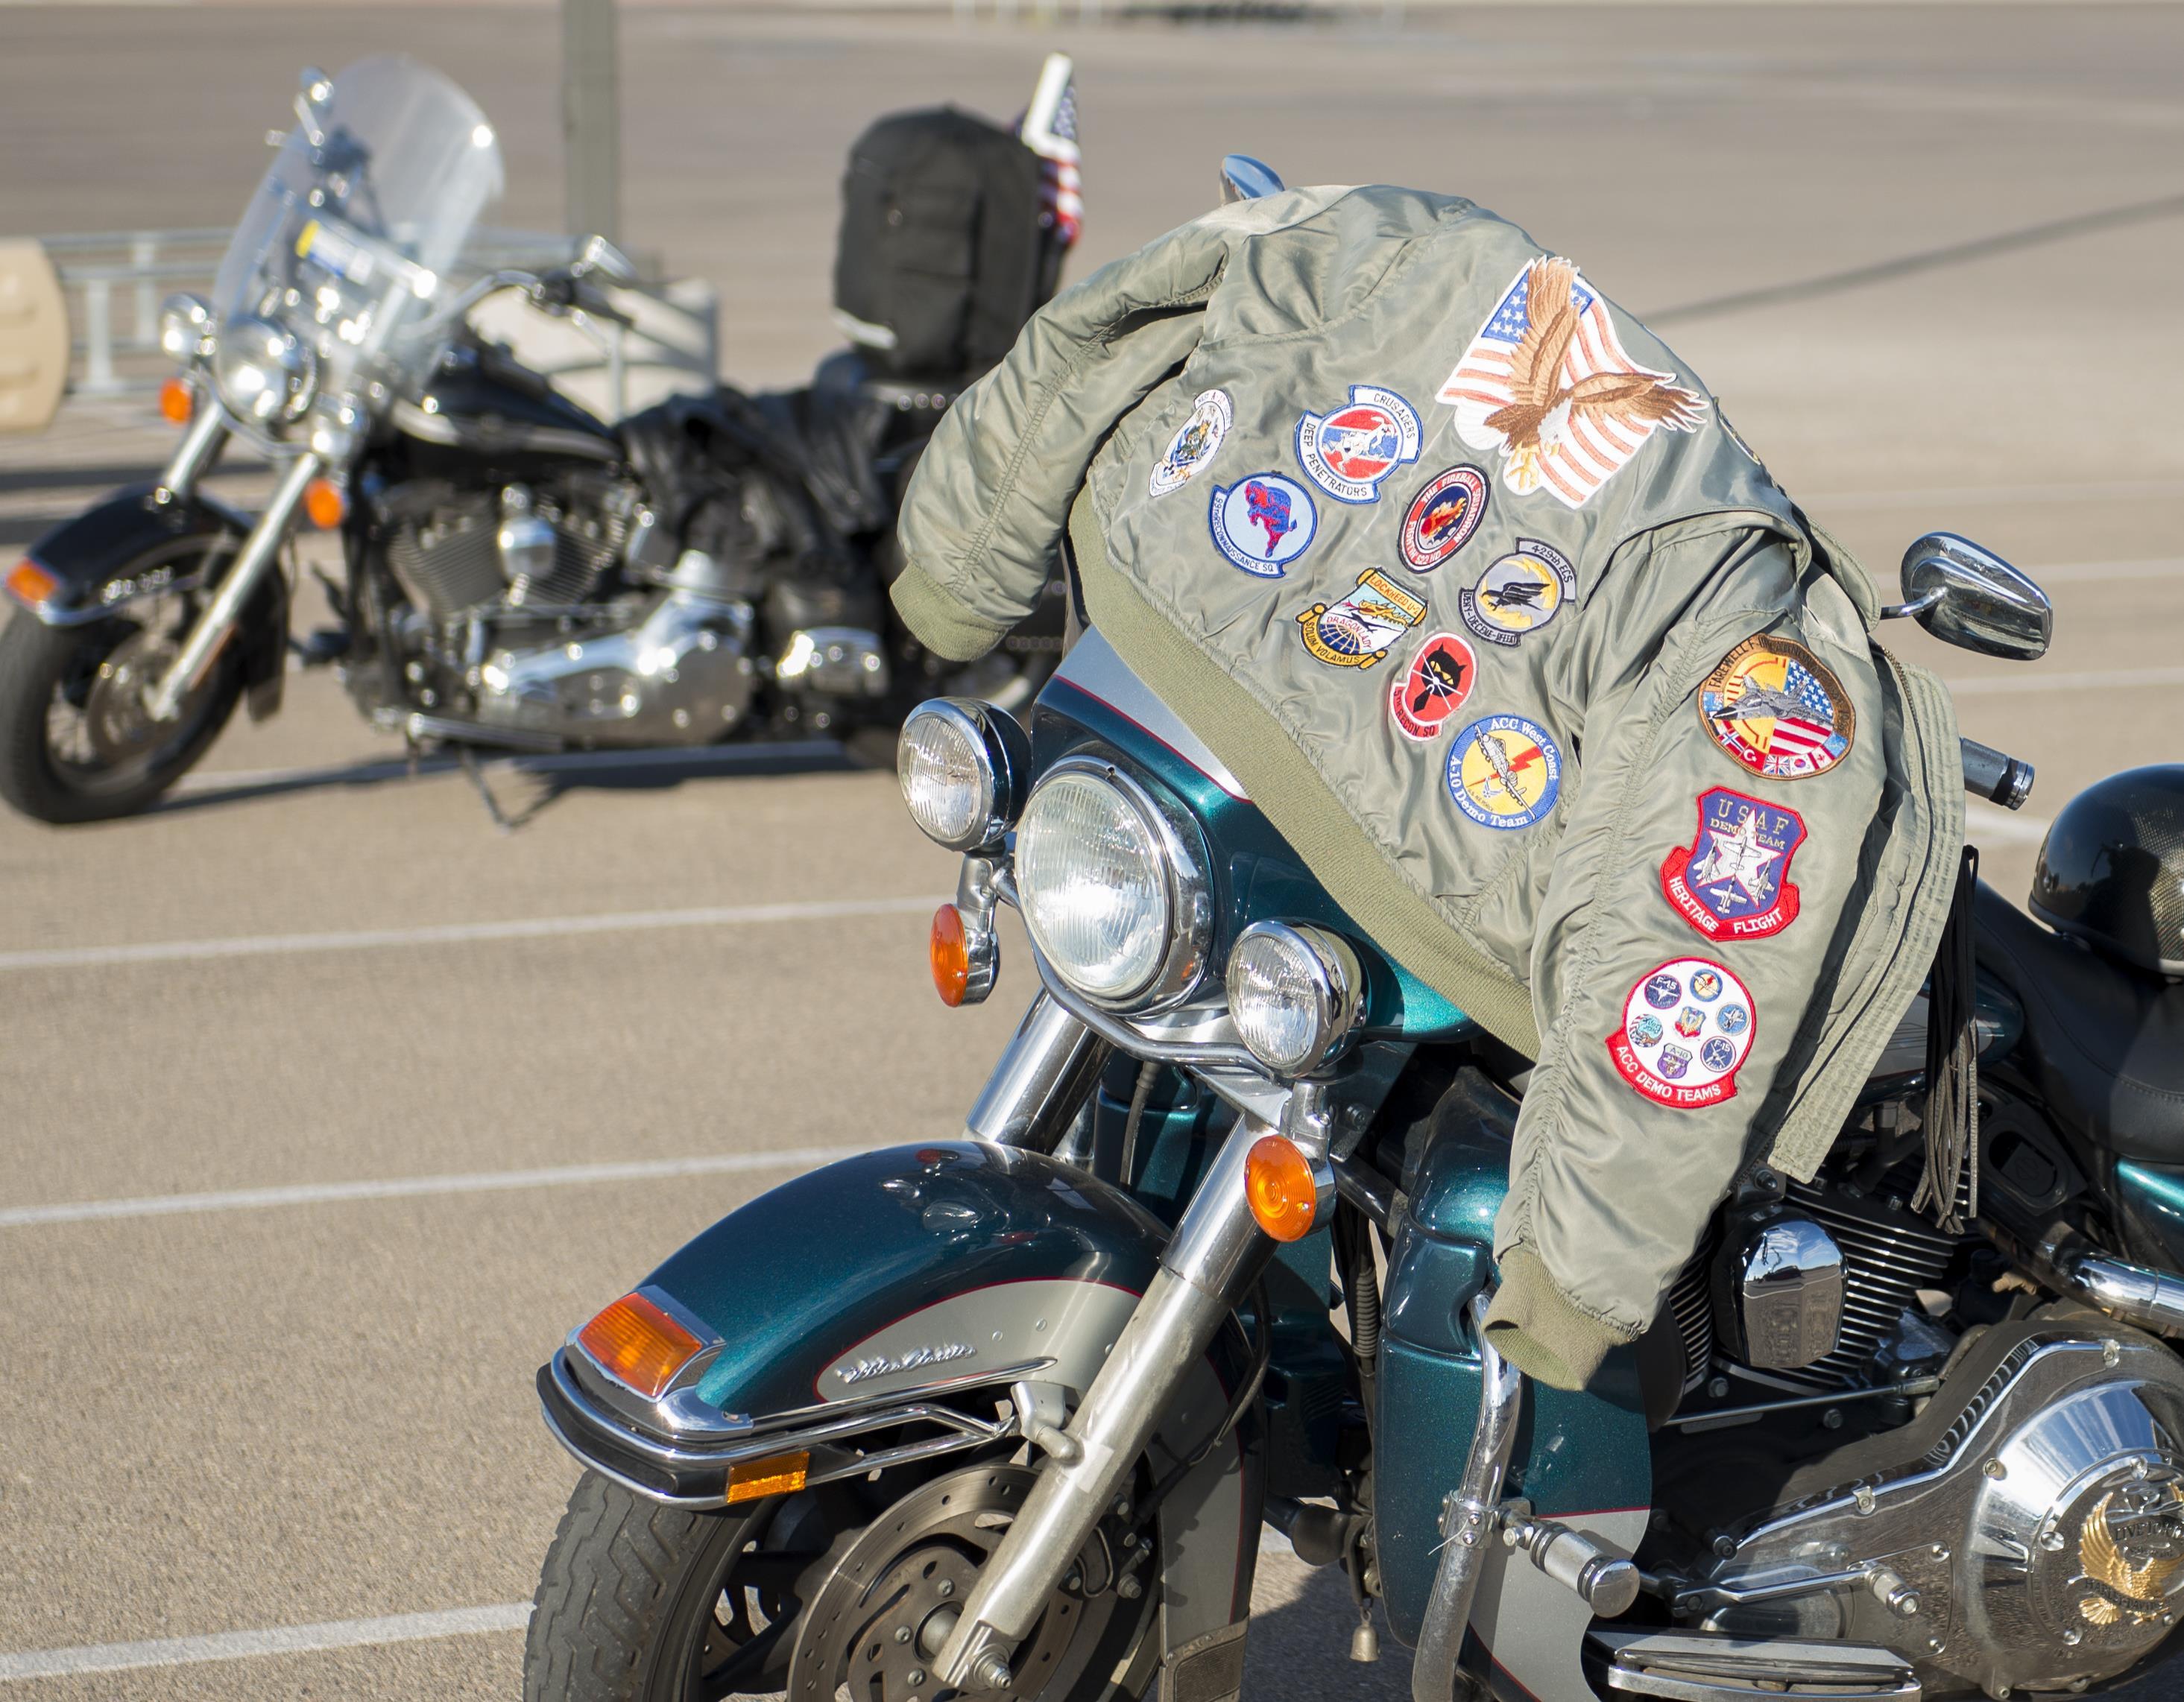 Satan's choice mc (motorcycle club) one percenter bikers.